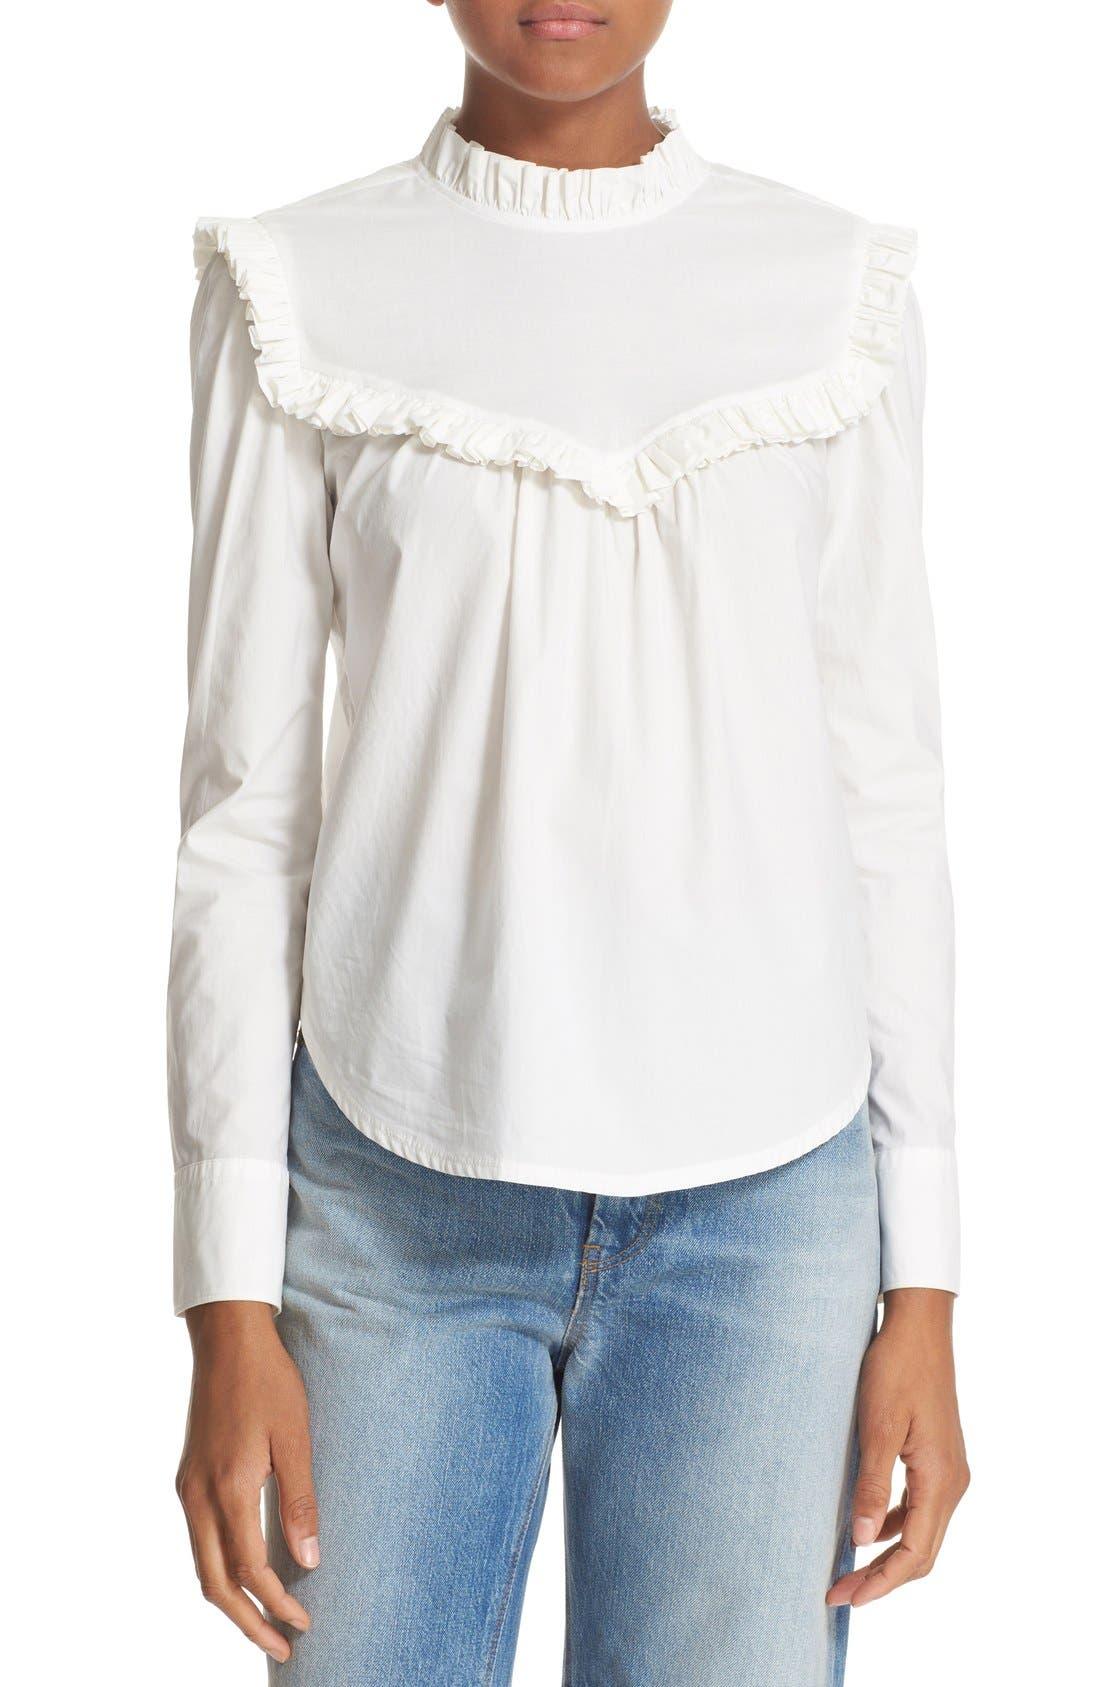 Alternate Image 1 Selected - La Vie Rebecca Taylor Ruffle Cotton Poplin Blouse